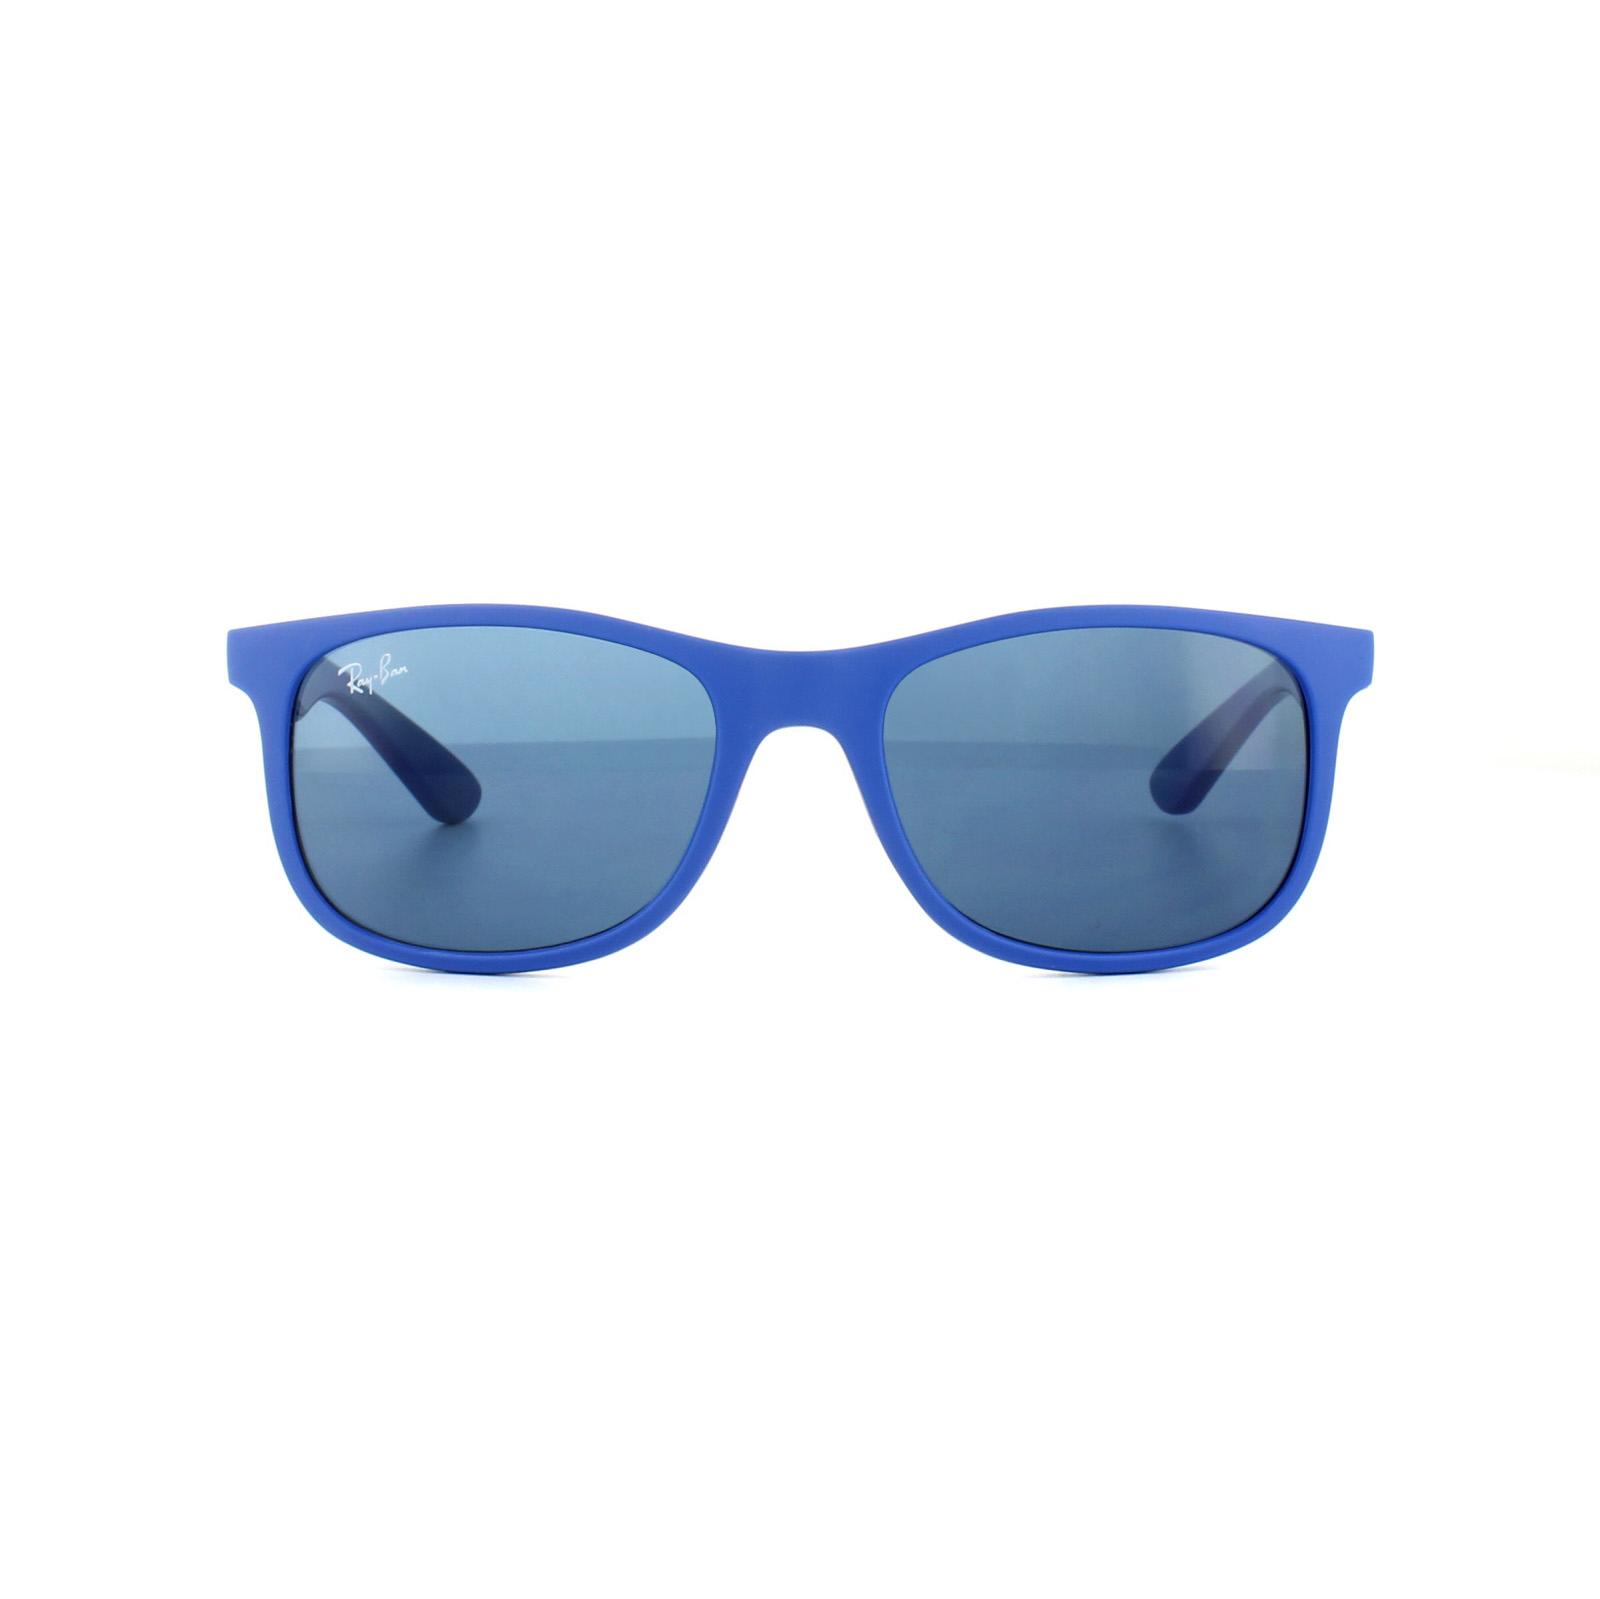 4ff7de6b79c Ray-Ban Junior Sunglasses 9062 701780 Blue Blue 8053672474664